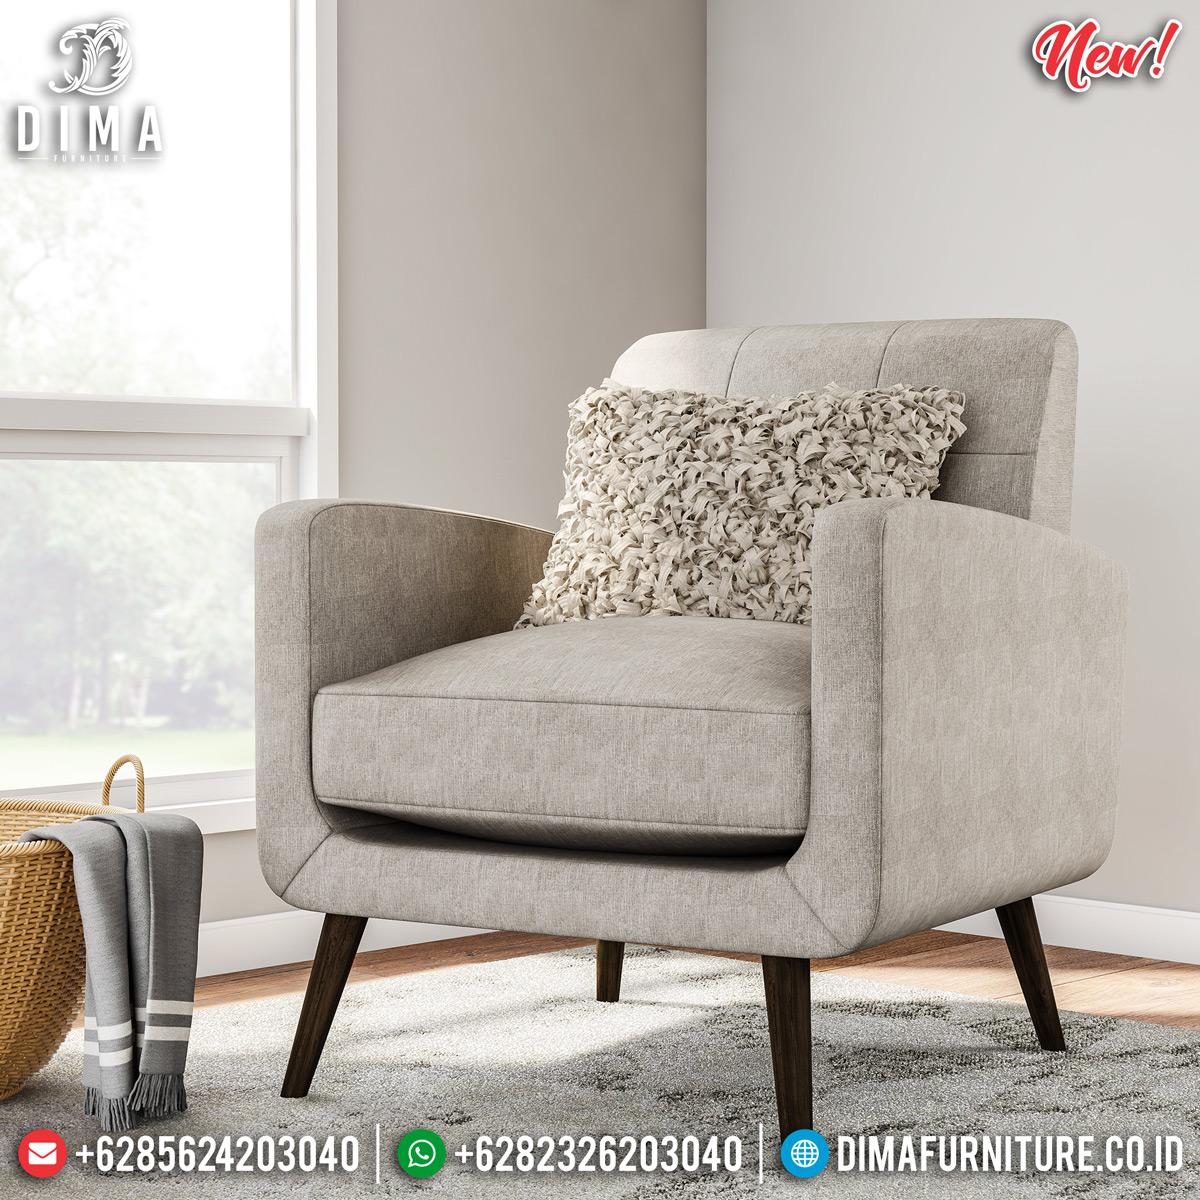 New Model Sofa Minimalis Single Epic Design Upholstery BT-0735 Model 2